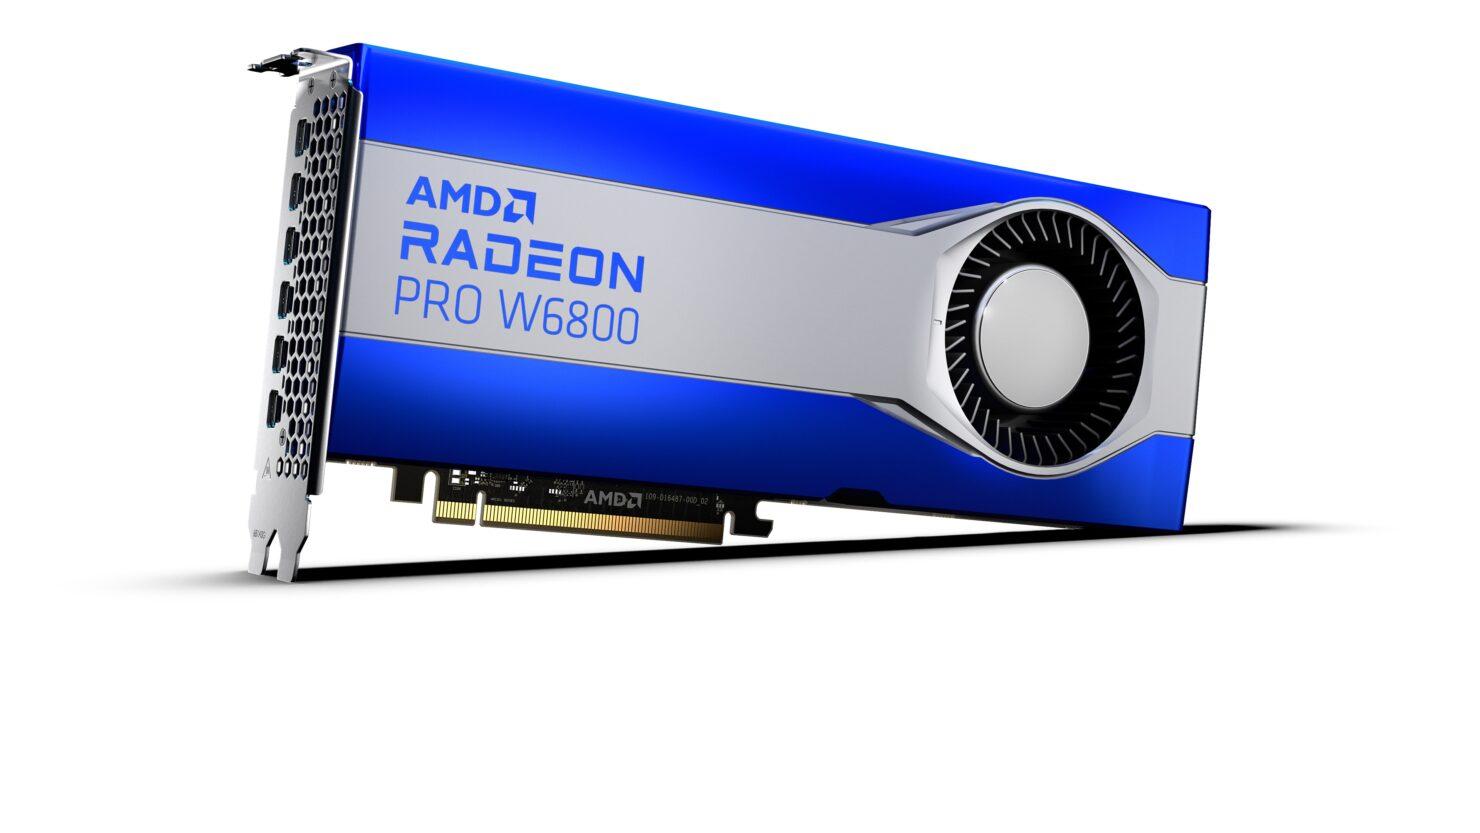 amd-radeon-pro-w6800-graphics-card-_1